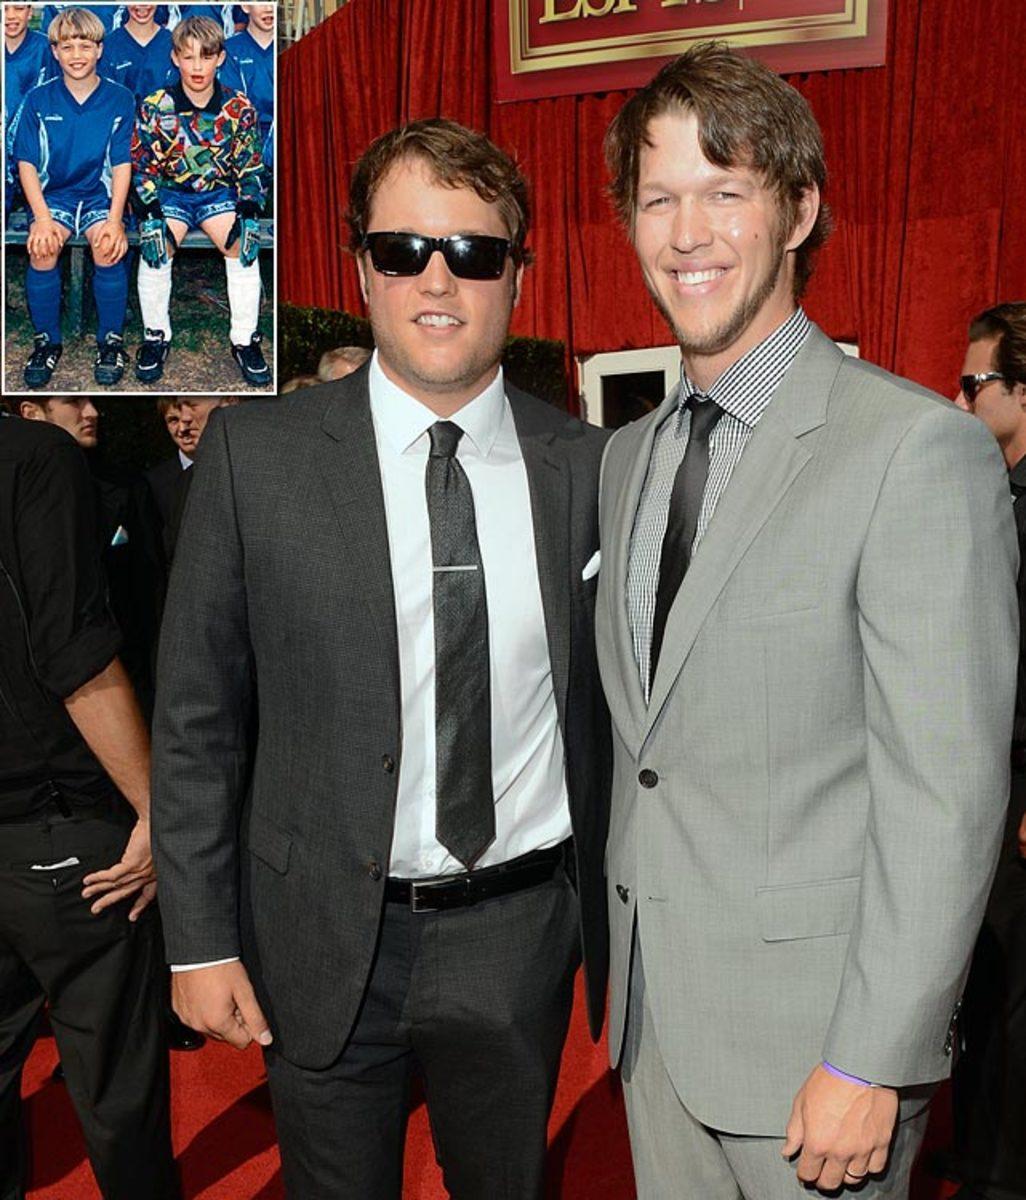 Matthew Stafford and Clayton Kershaw